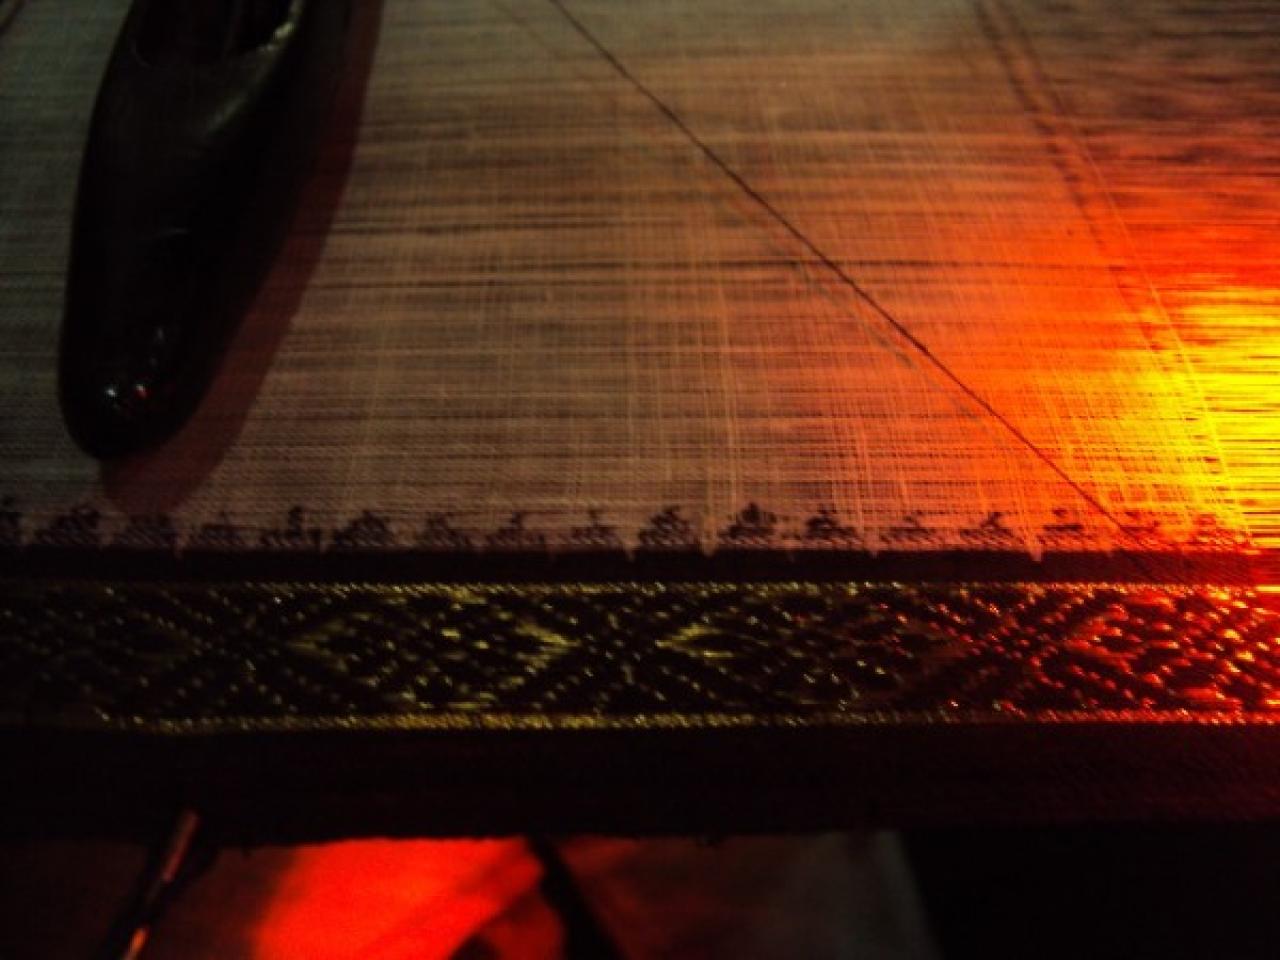 Handloom Khadi weaving at Ponduru, Srikakulam, Andhra Pradesh (N Aditya Madhav/Wikimedia Commons)